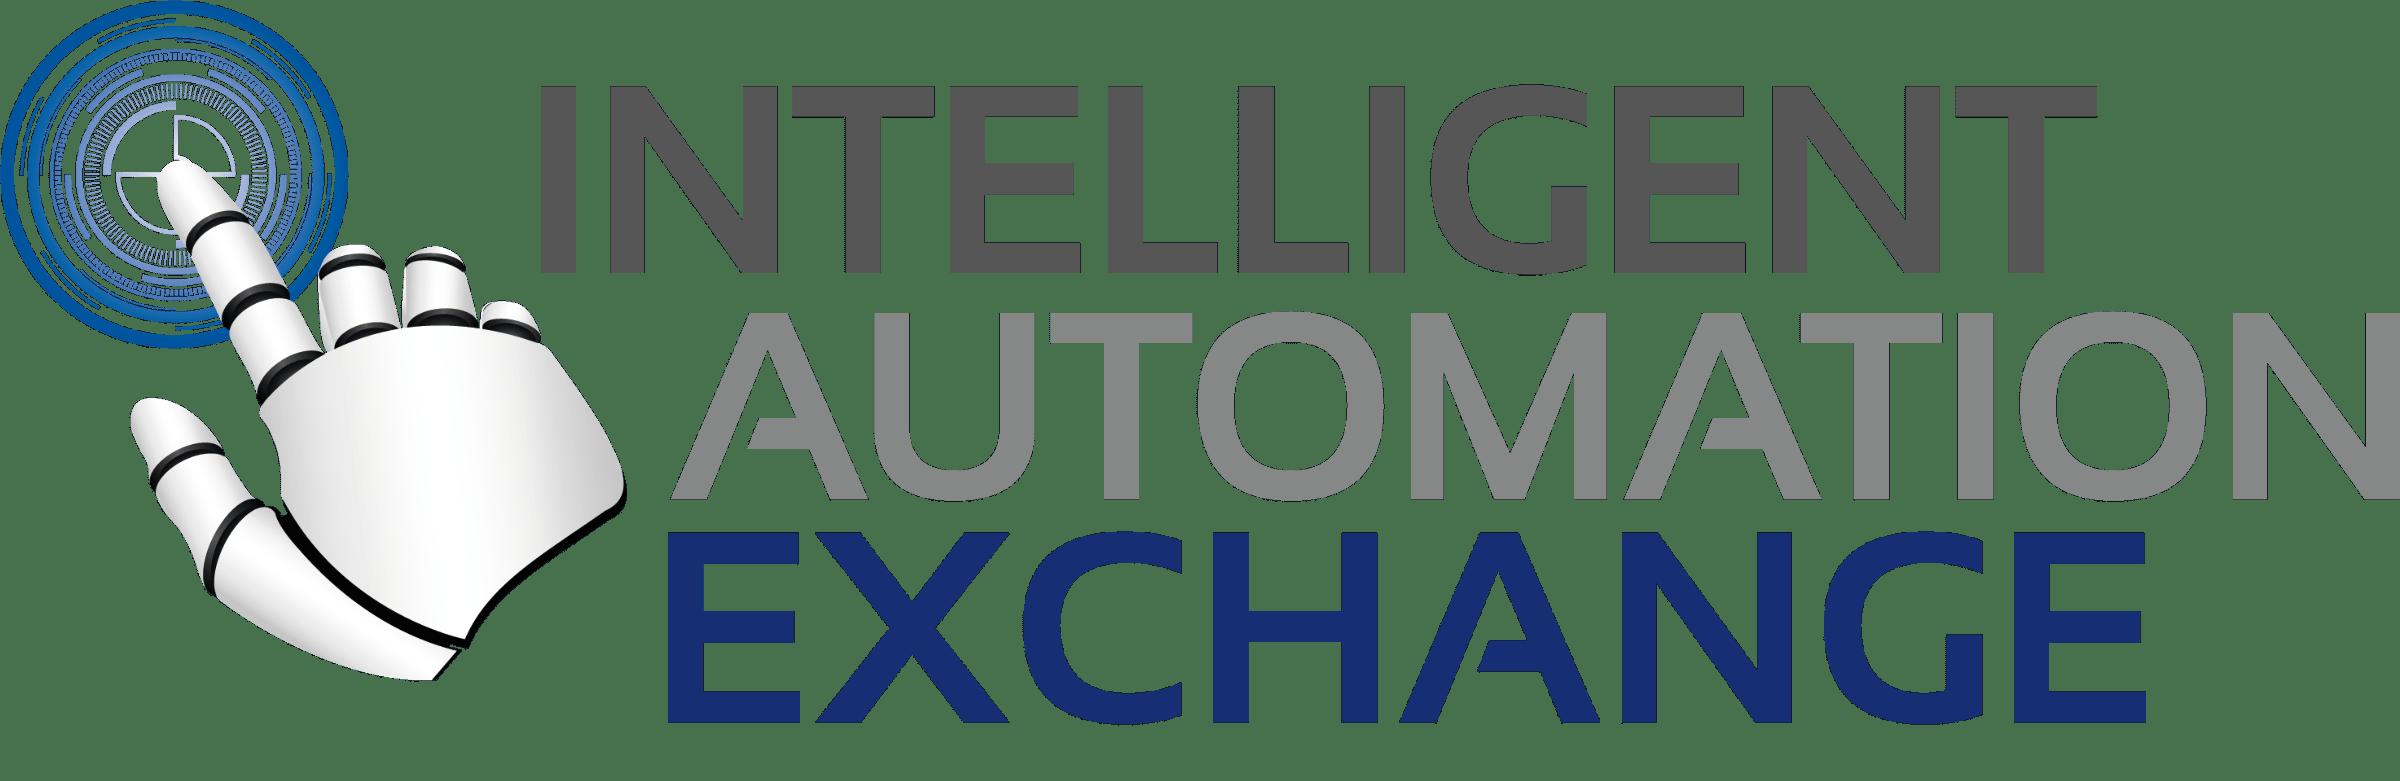 Intelligent Automation Exchange logo